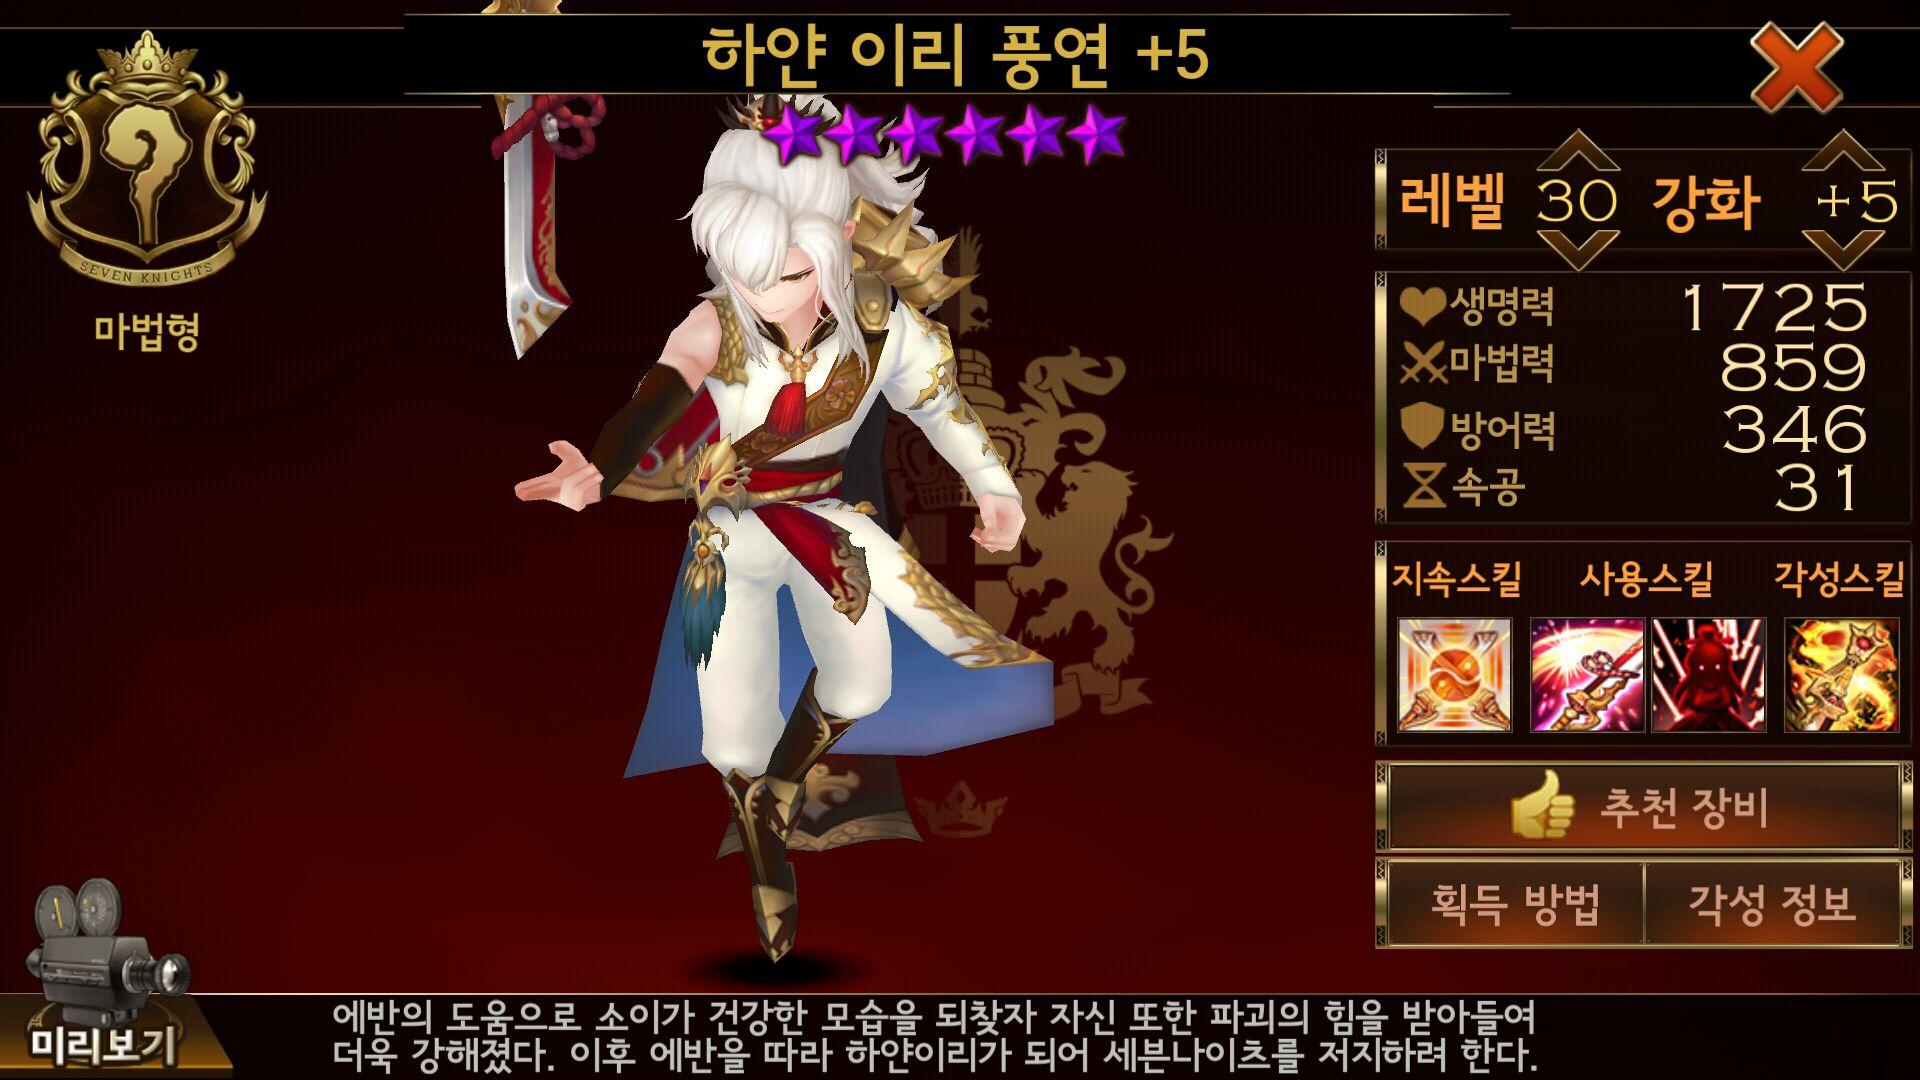 Korean 7k - Awakened Pung Yeon (Feng Yan) (Line) - Wattpad